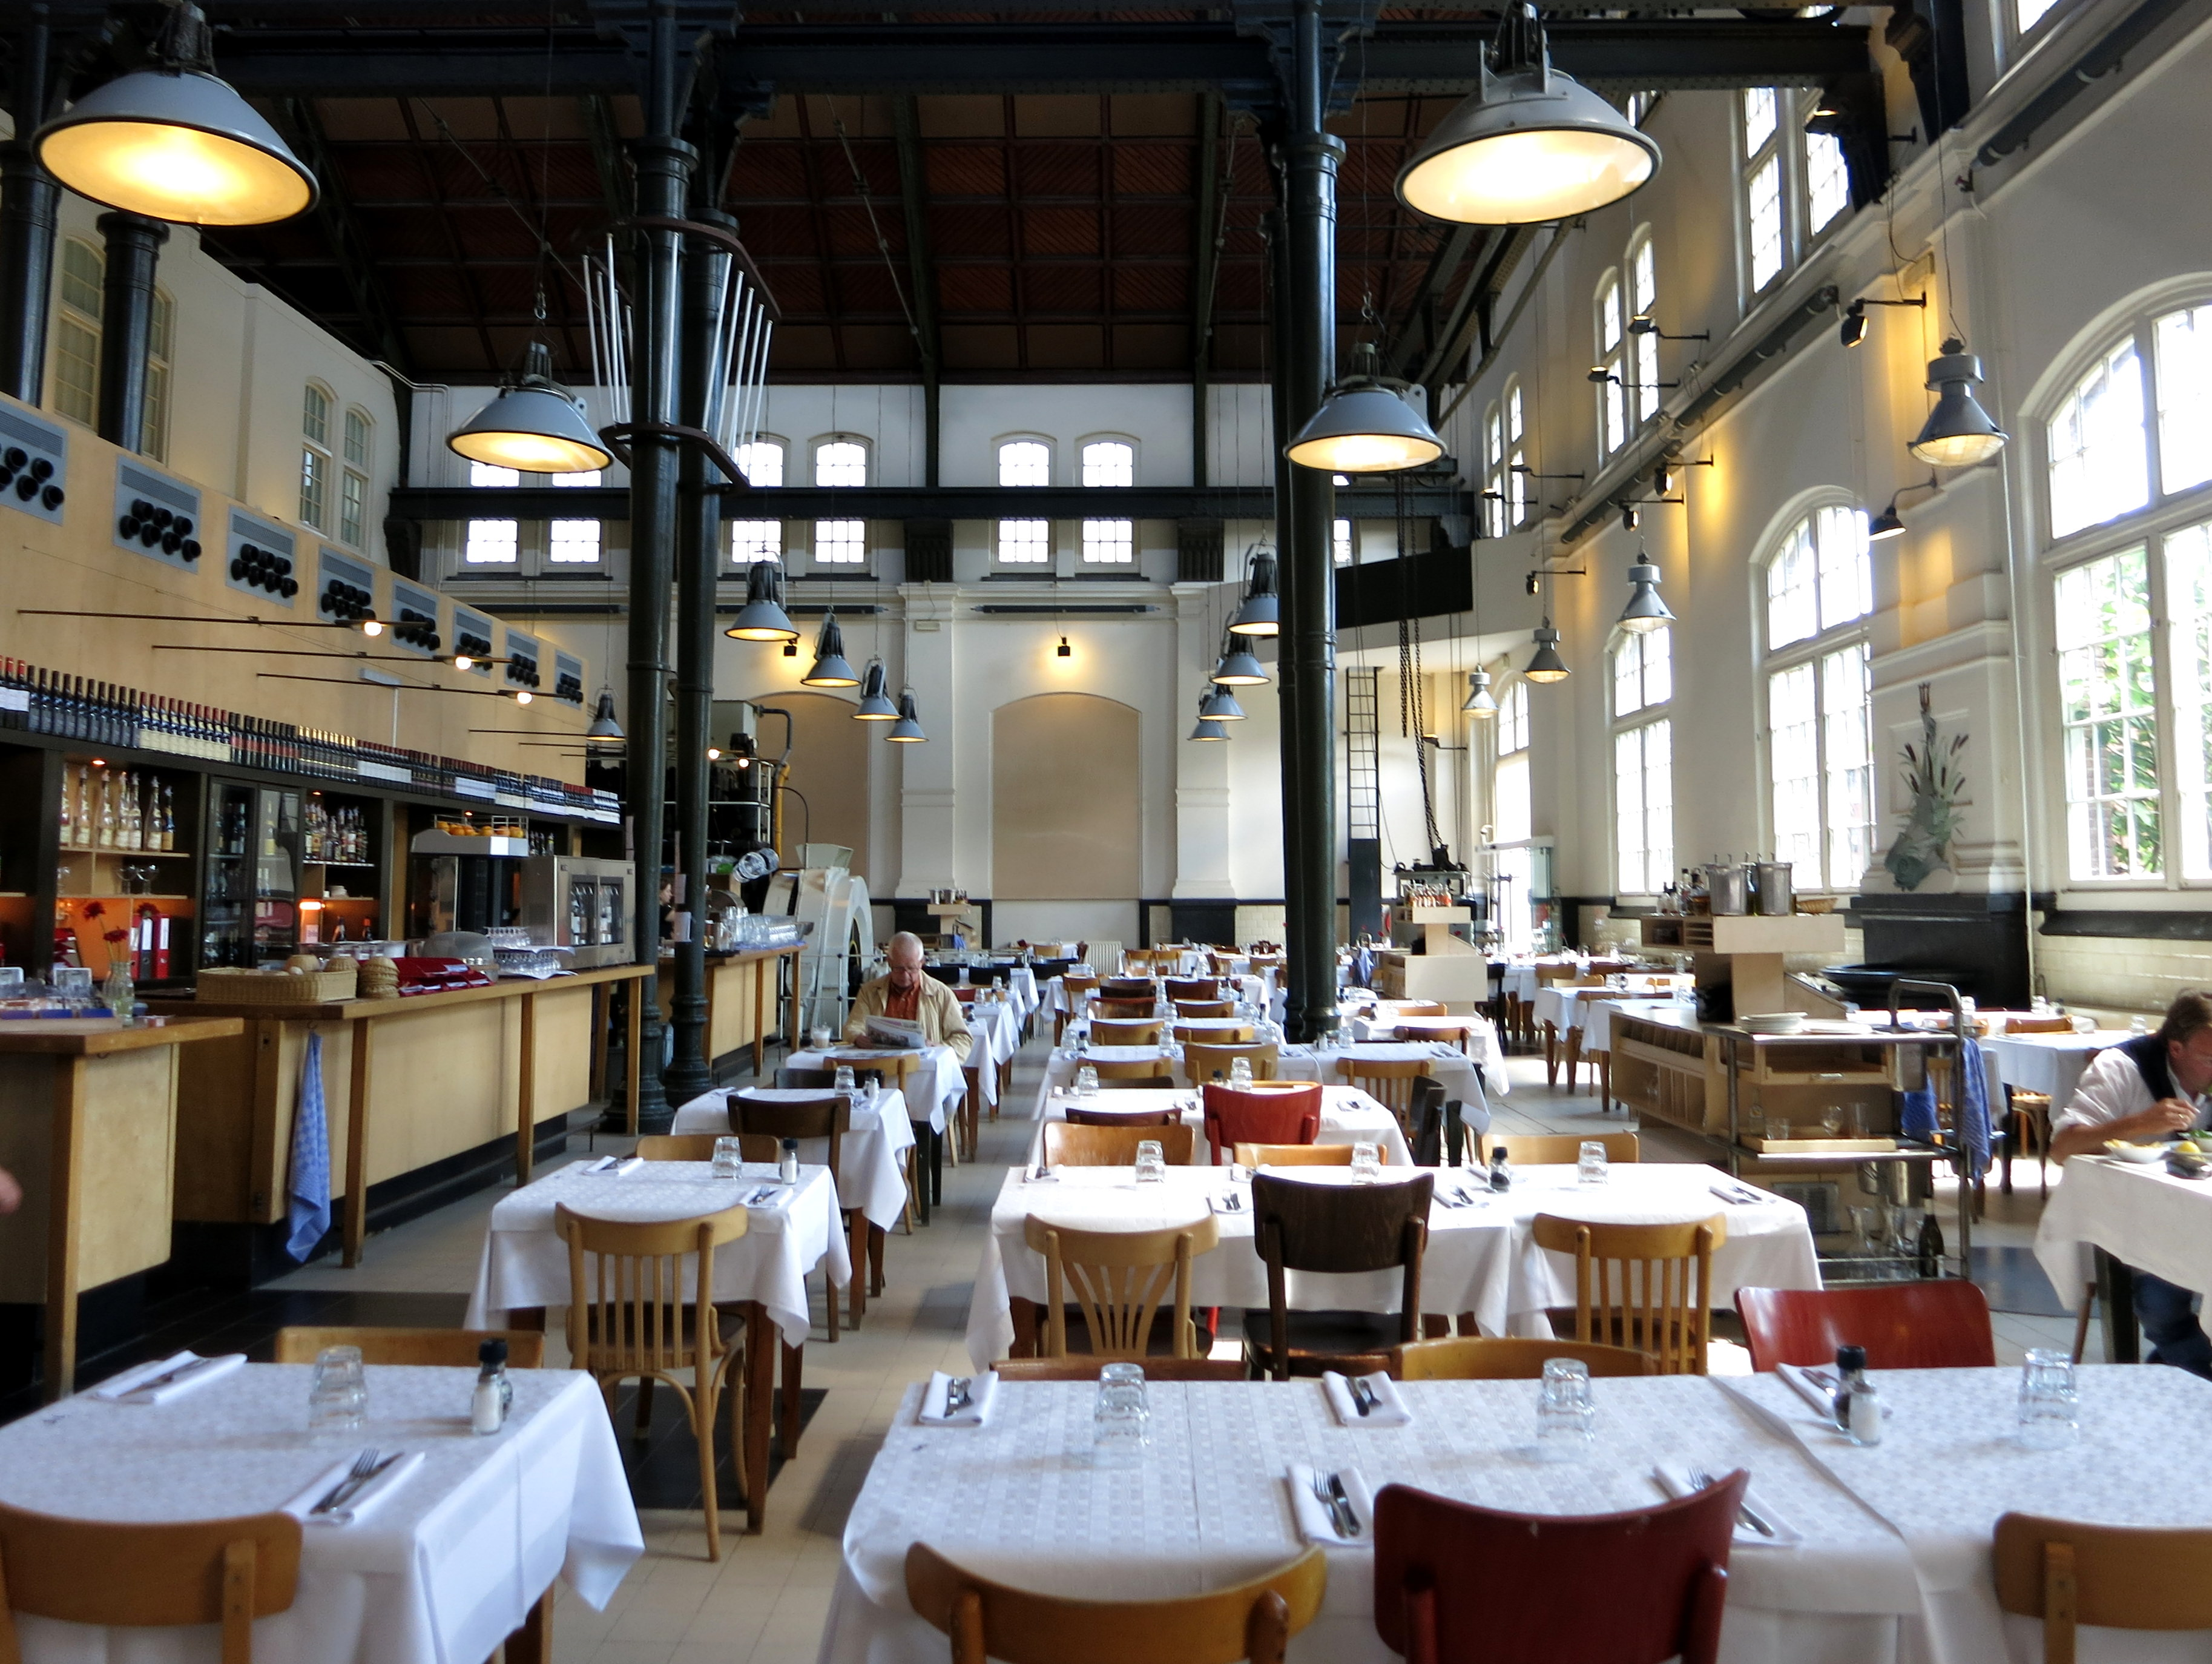 Cafe restaurant amsterdam spacious restaurant in for The restaurant